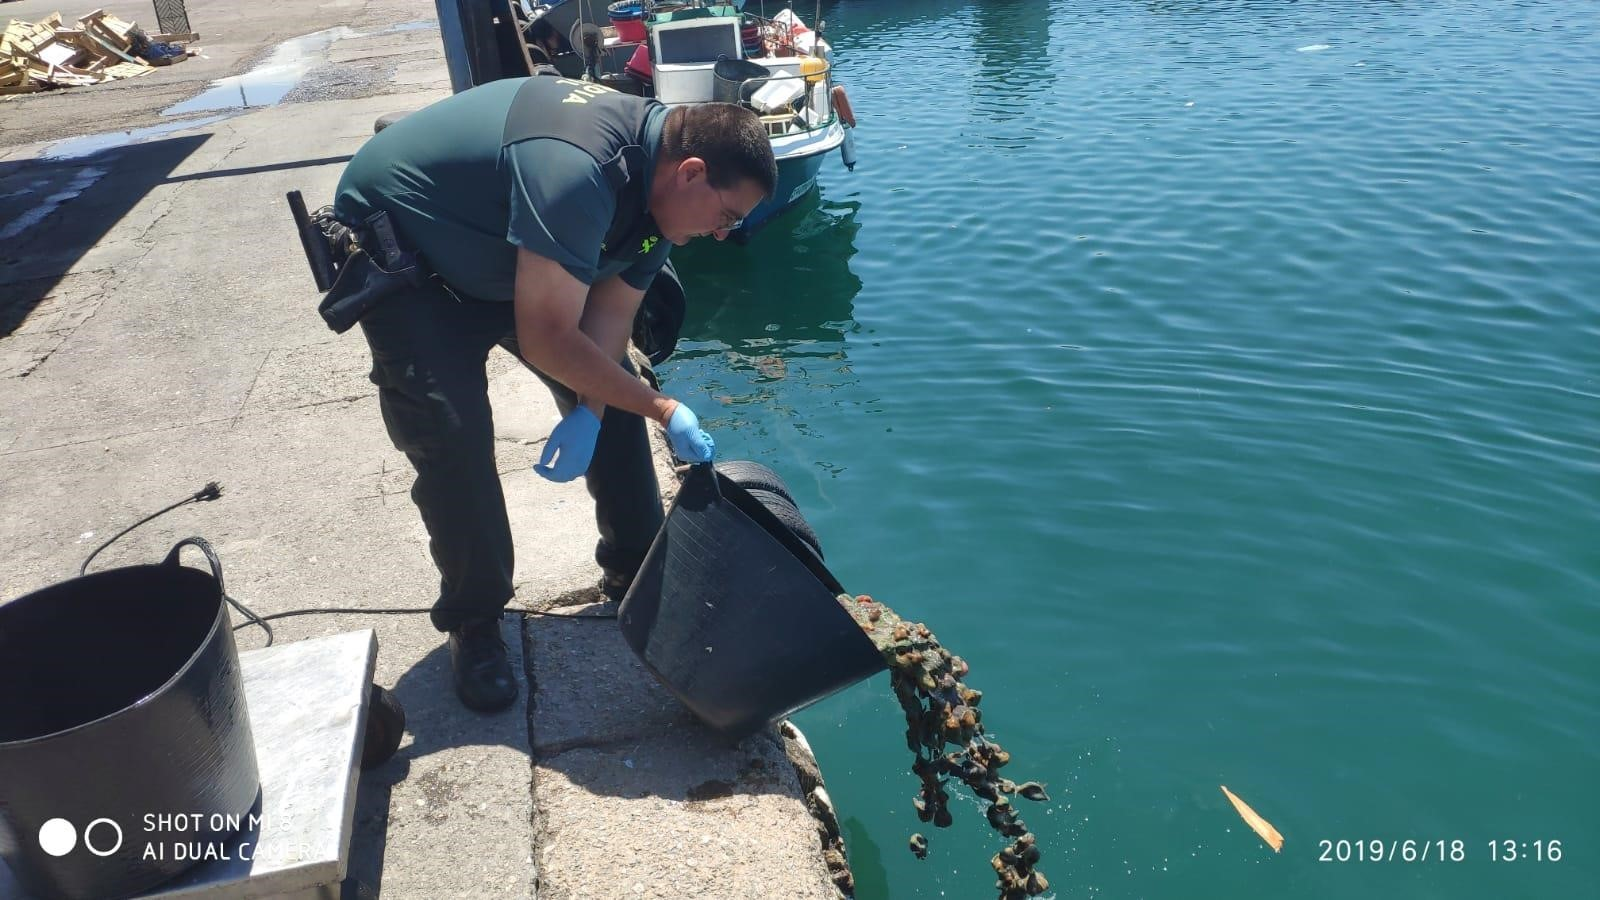 Intervenidos casi 200 kilos de anémonas de mar